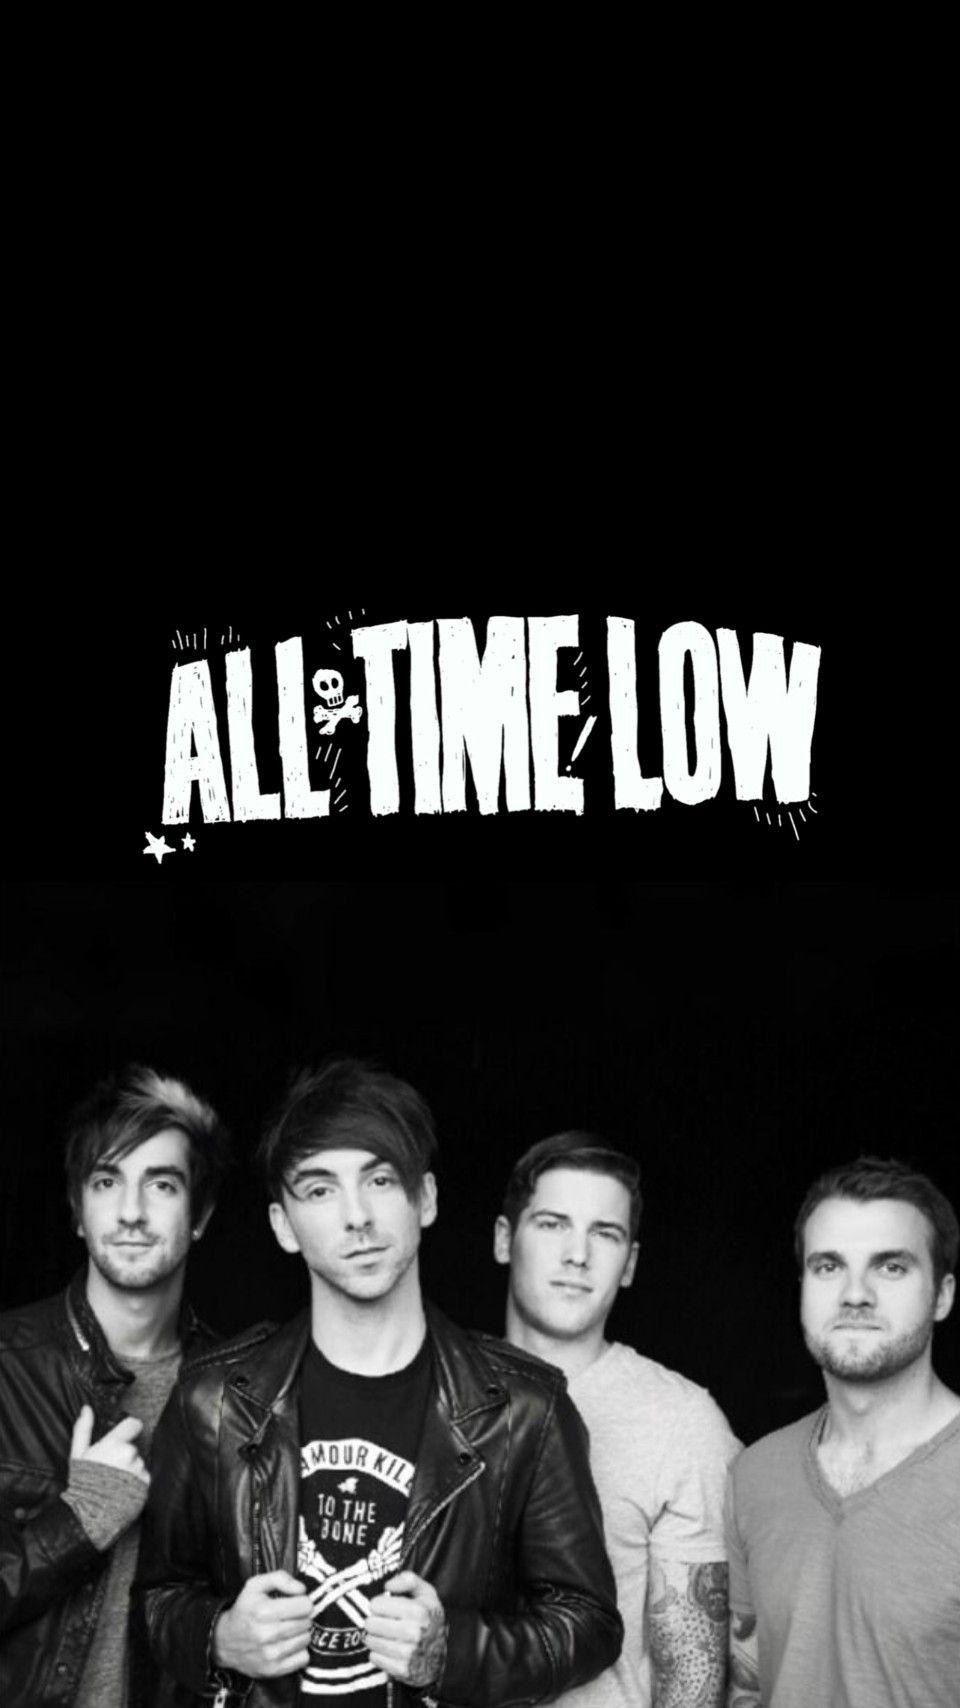 All Time Low Wallpaper All Time Low Wallpaper All Time Low Poster All Time Low